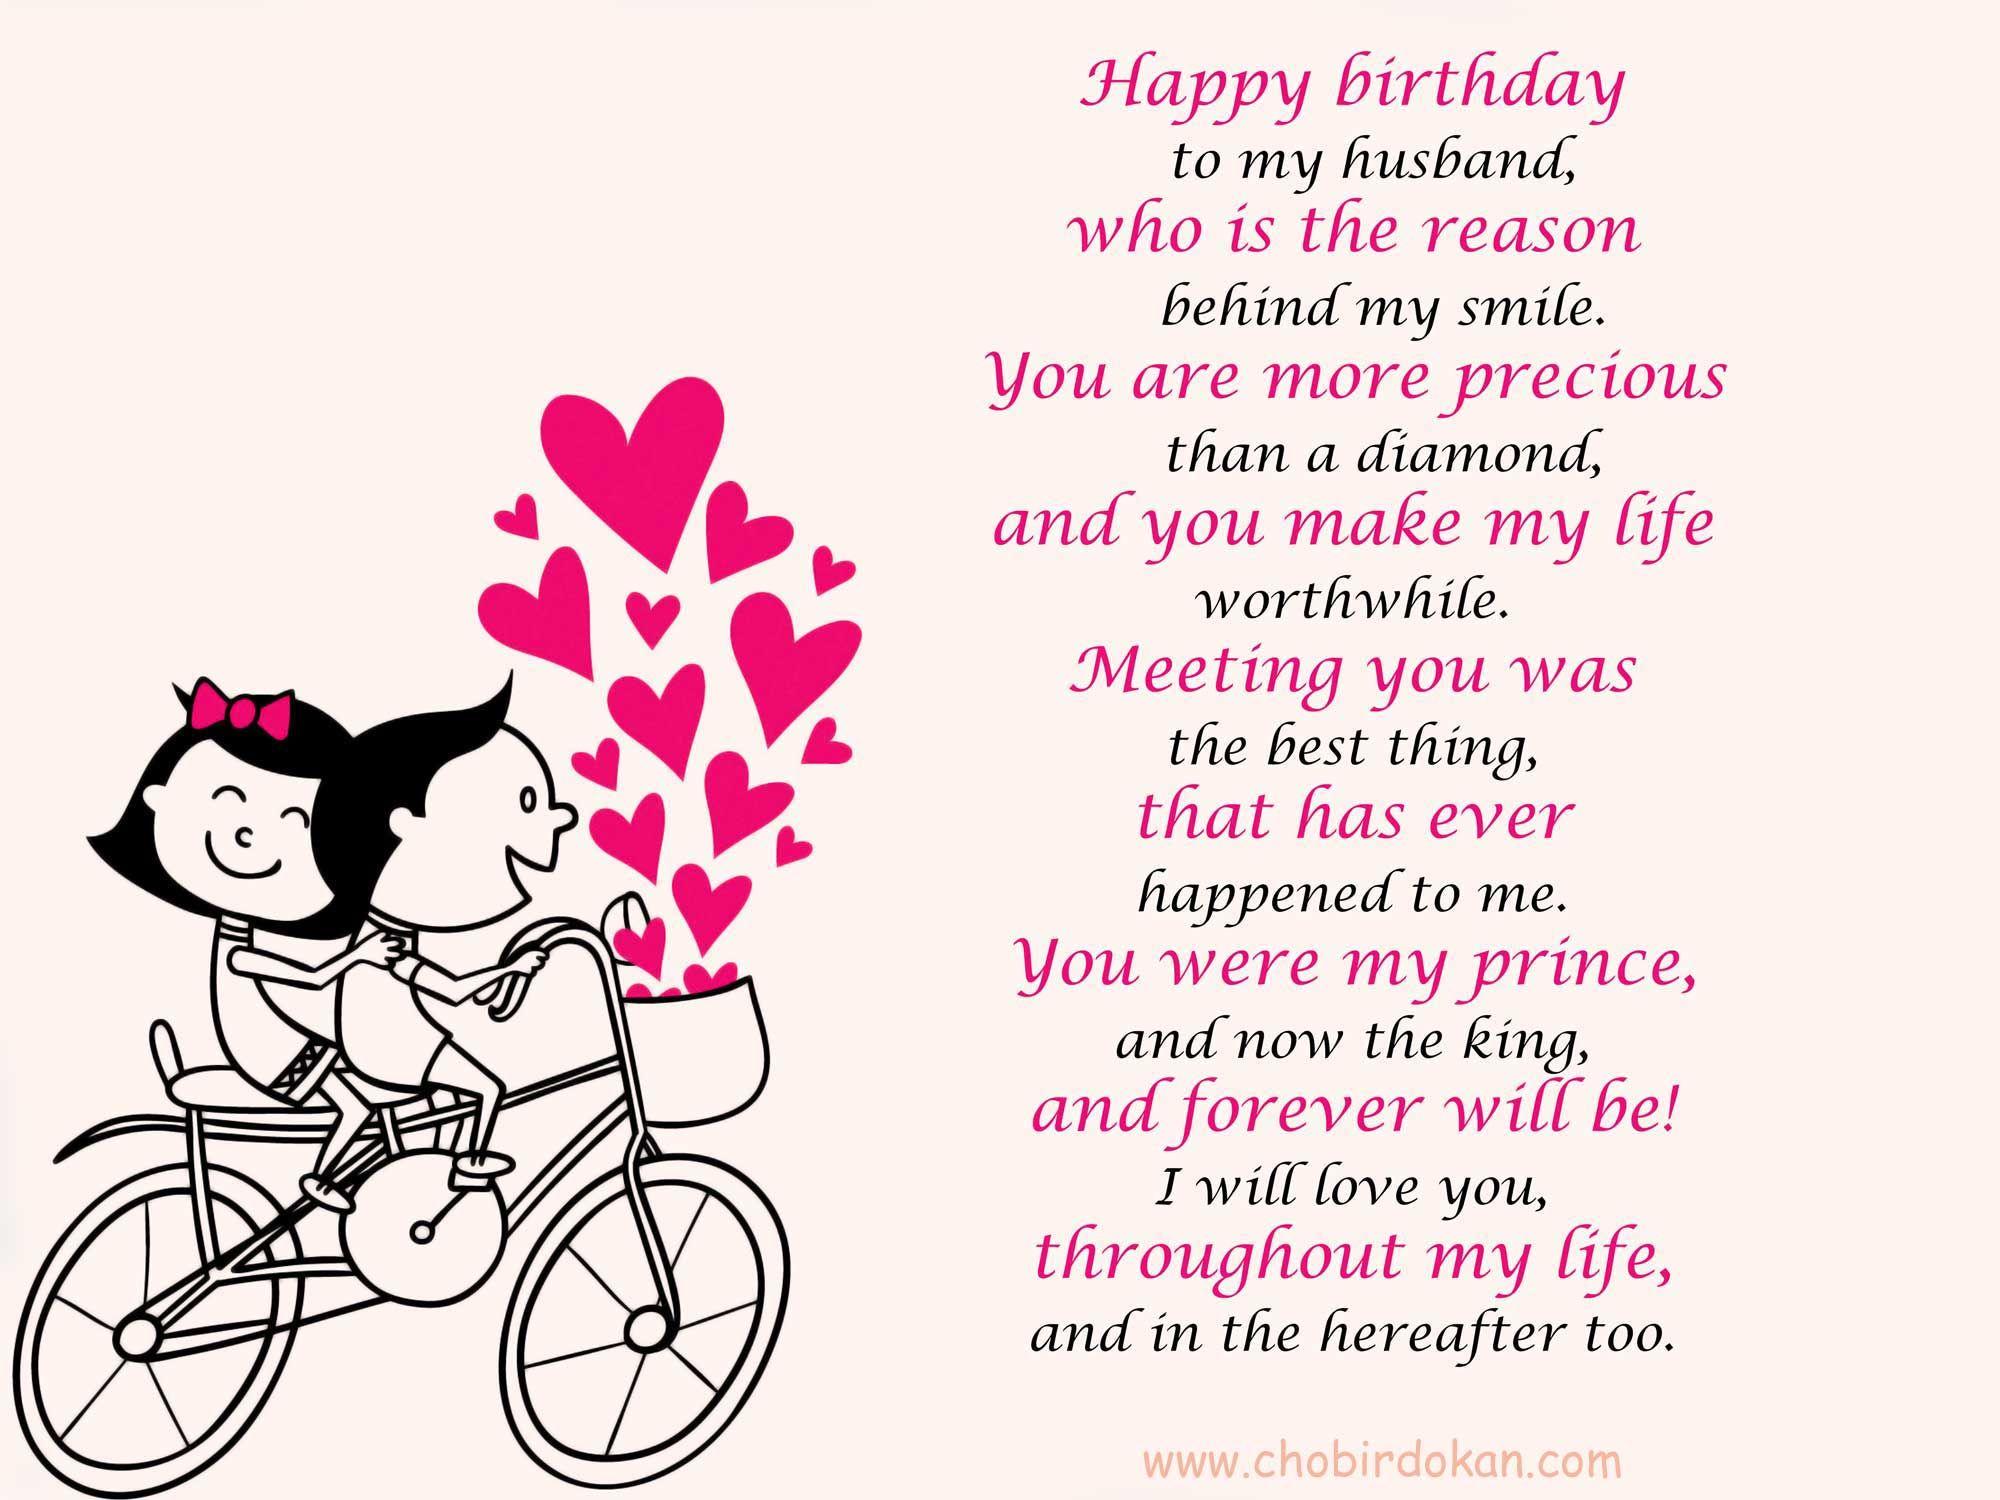 Cute happy birthday poem for husband poems